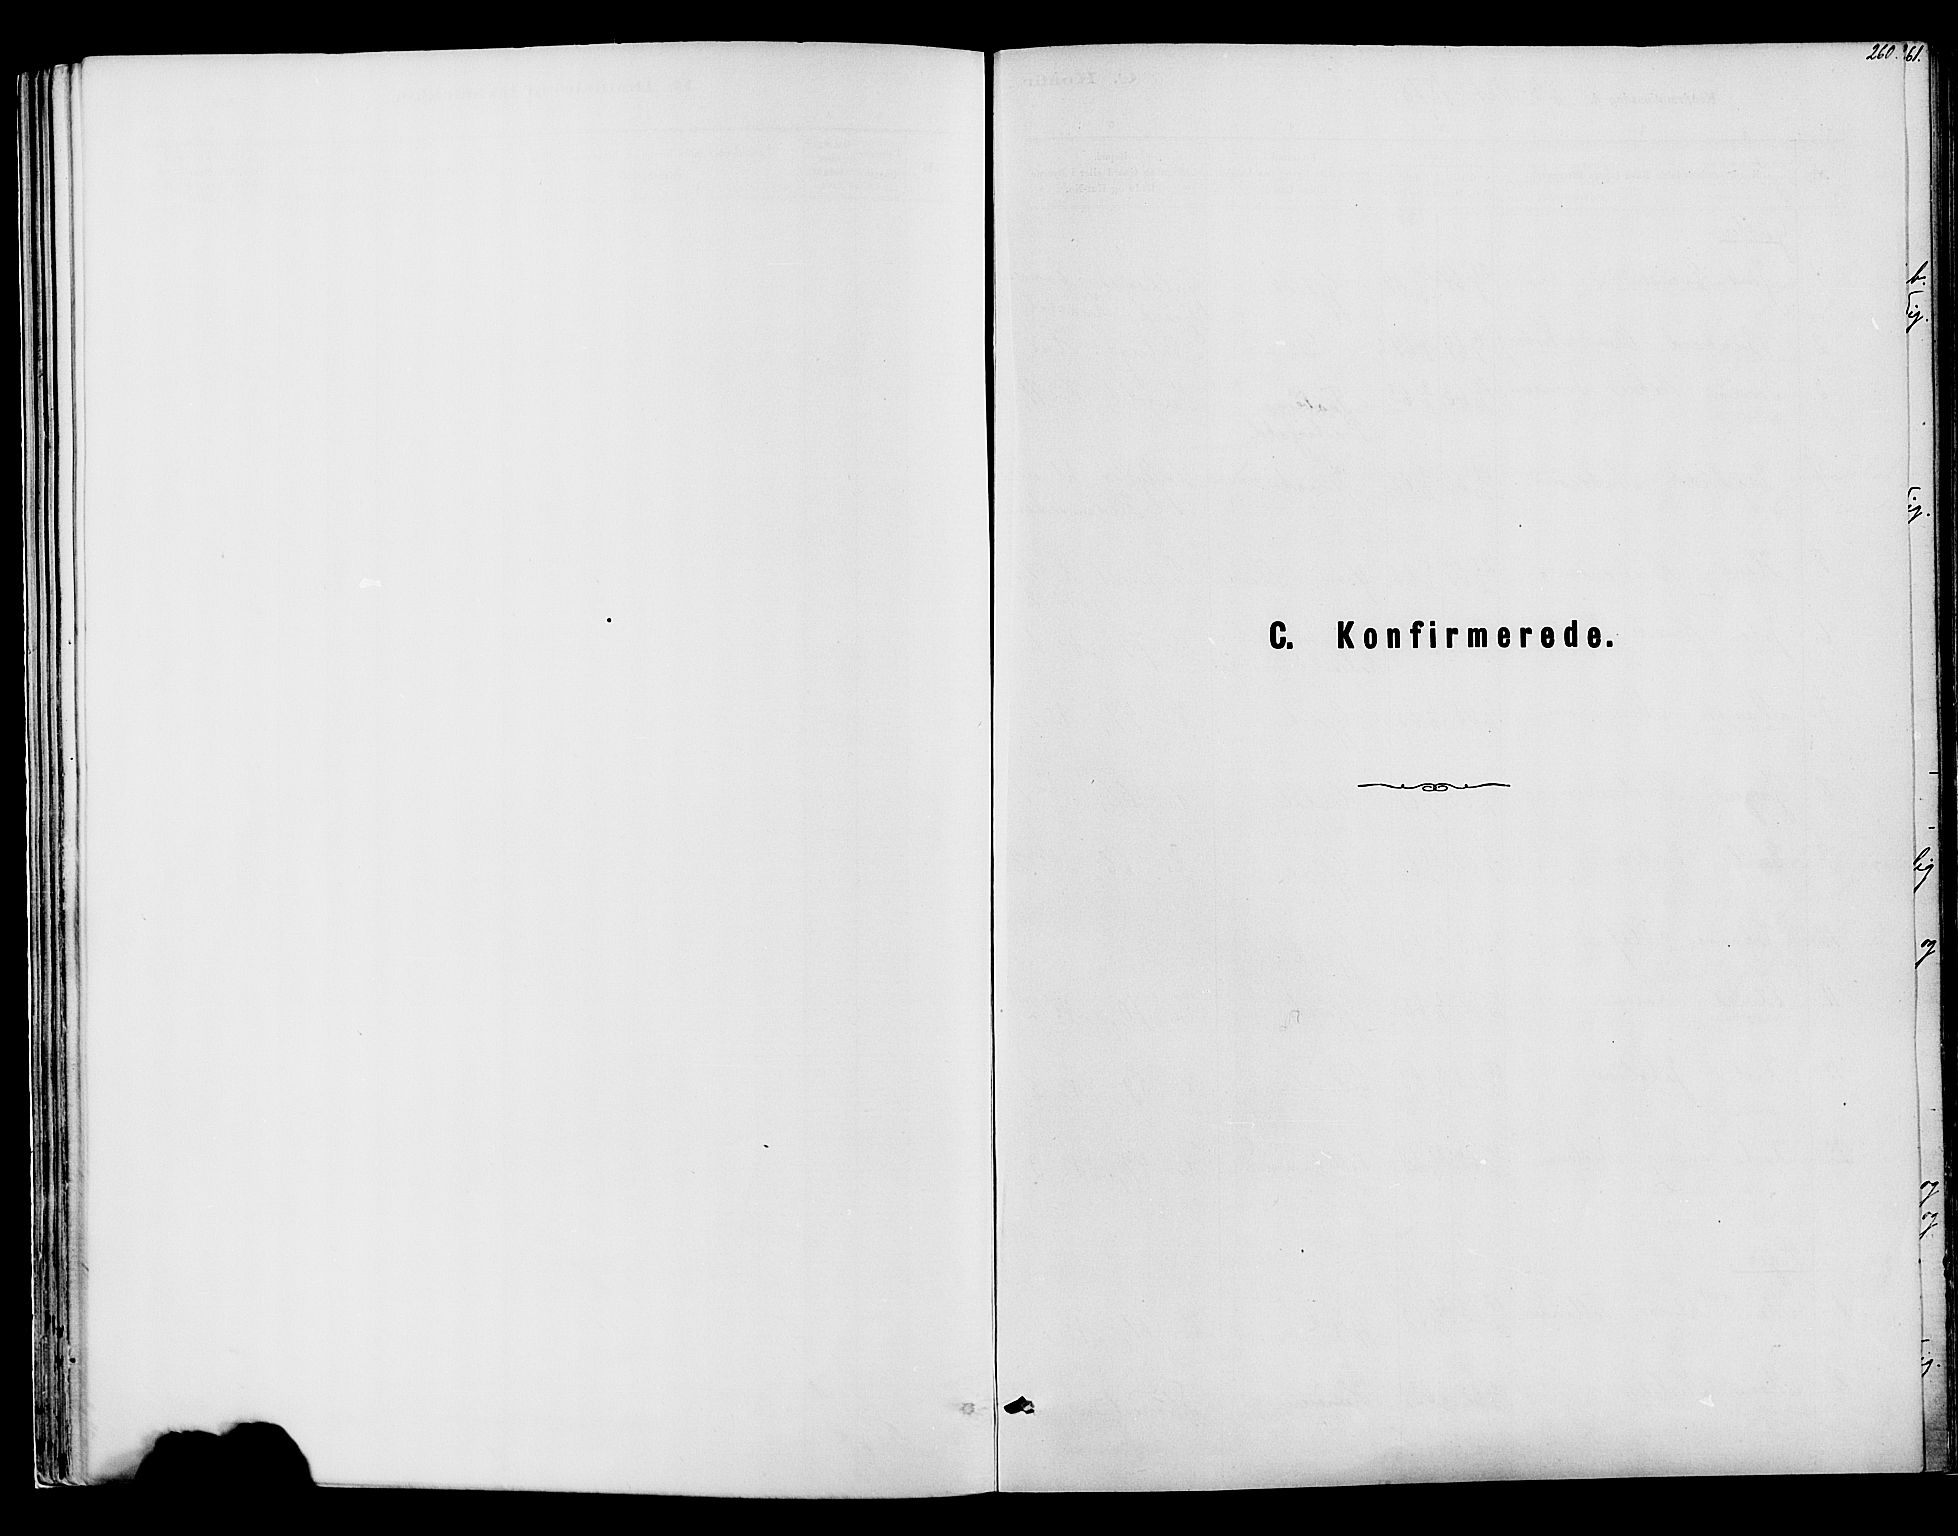 SAH, Vardal prestekontor, H/Ha/Haa/L0008: Ministerialbok nr. 8, 1878-1890, s. 260